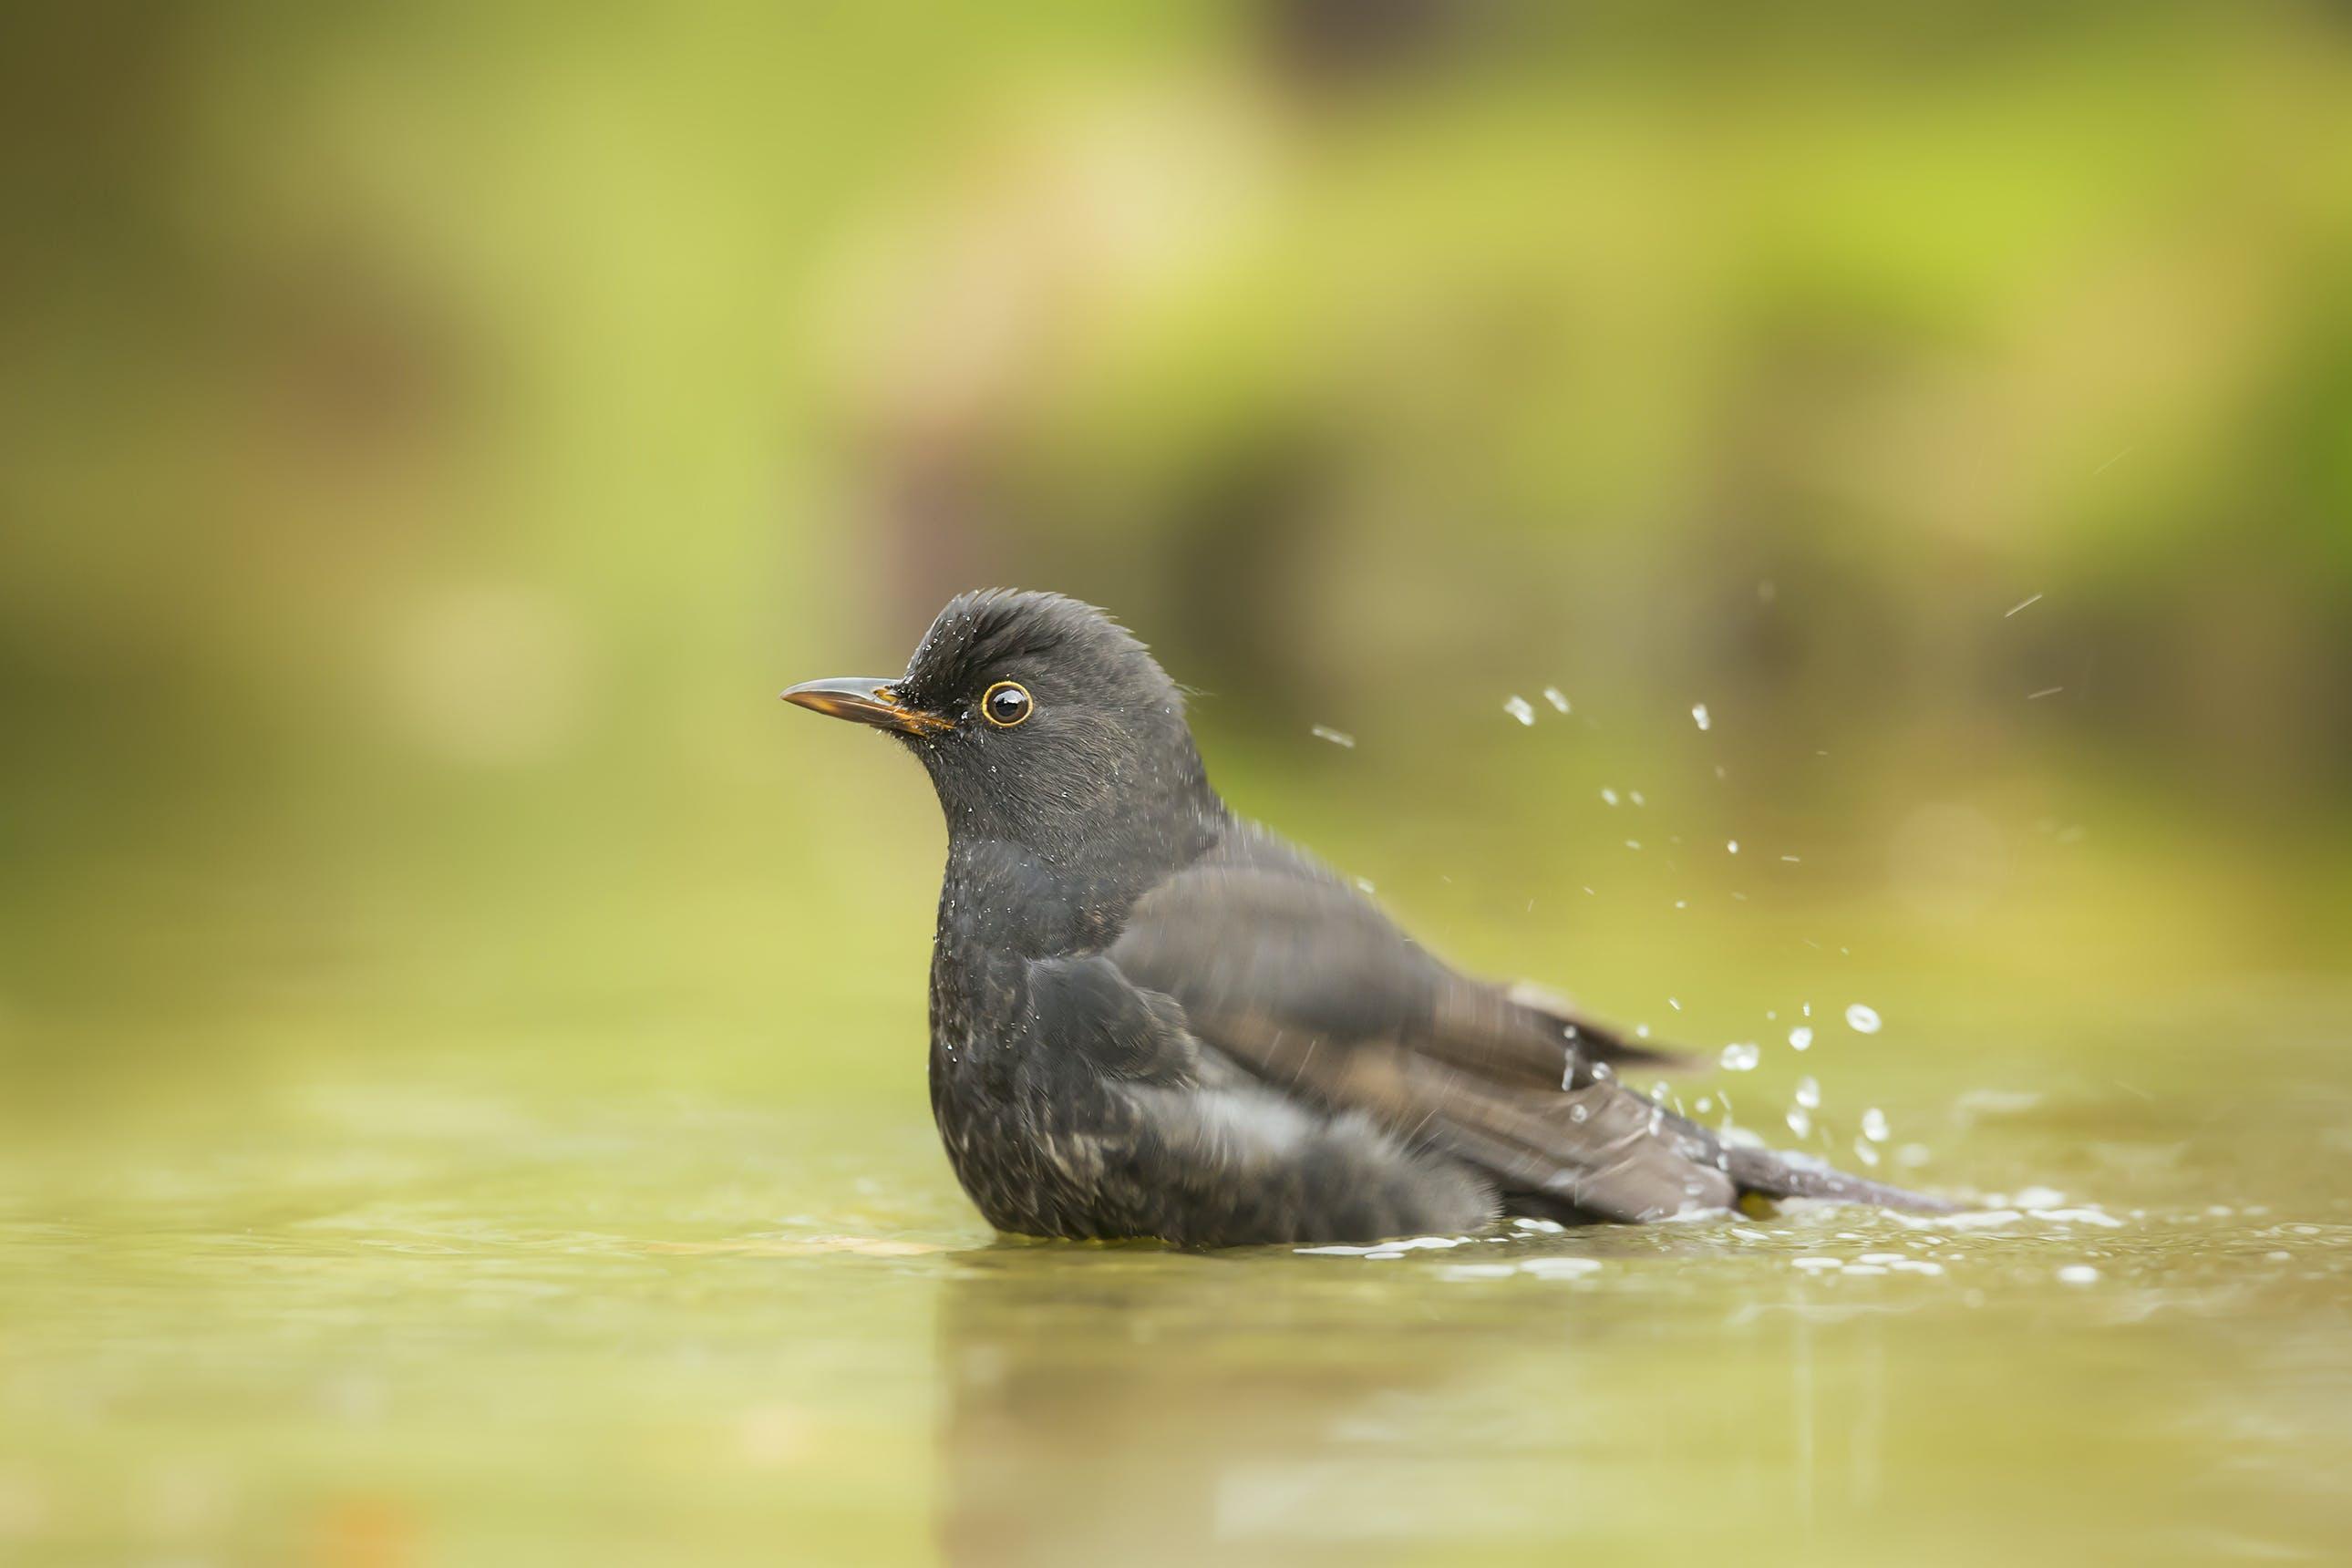 Close Up Photo of Gray Bird